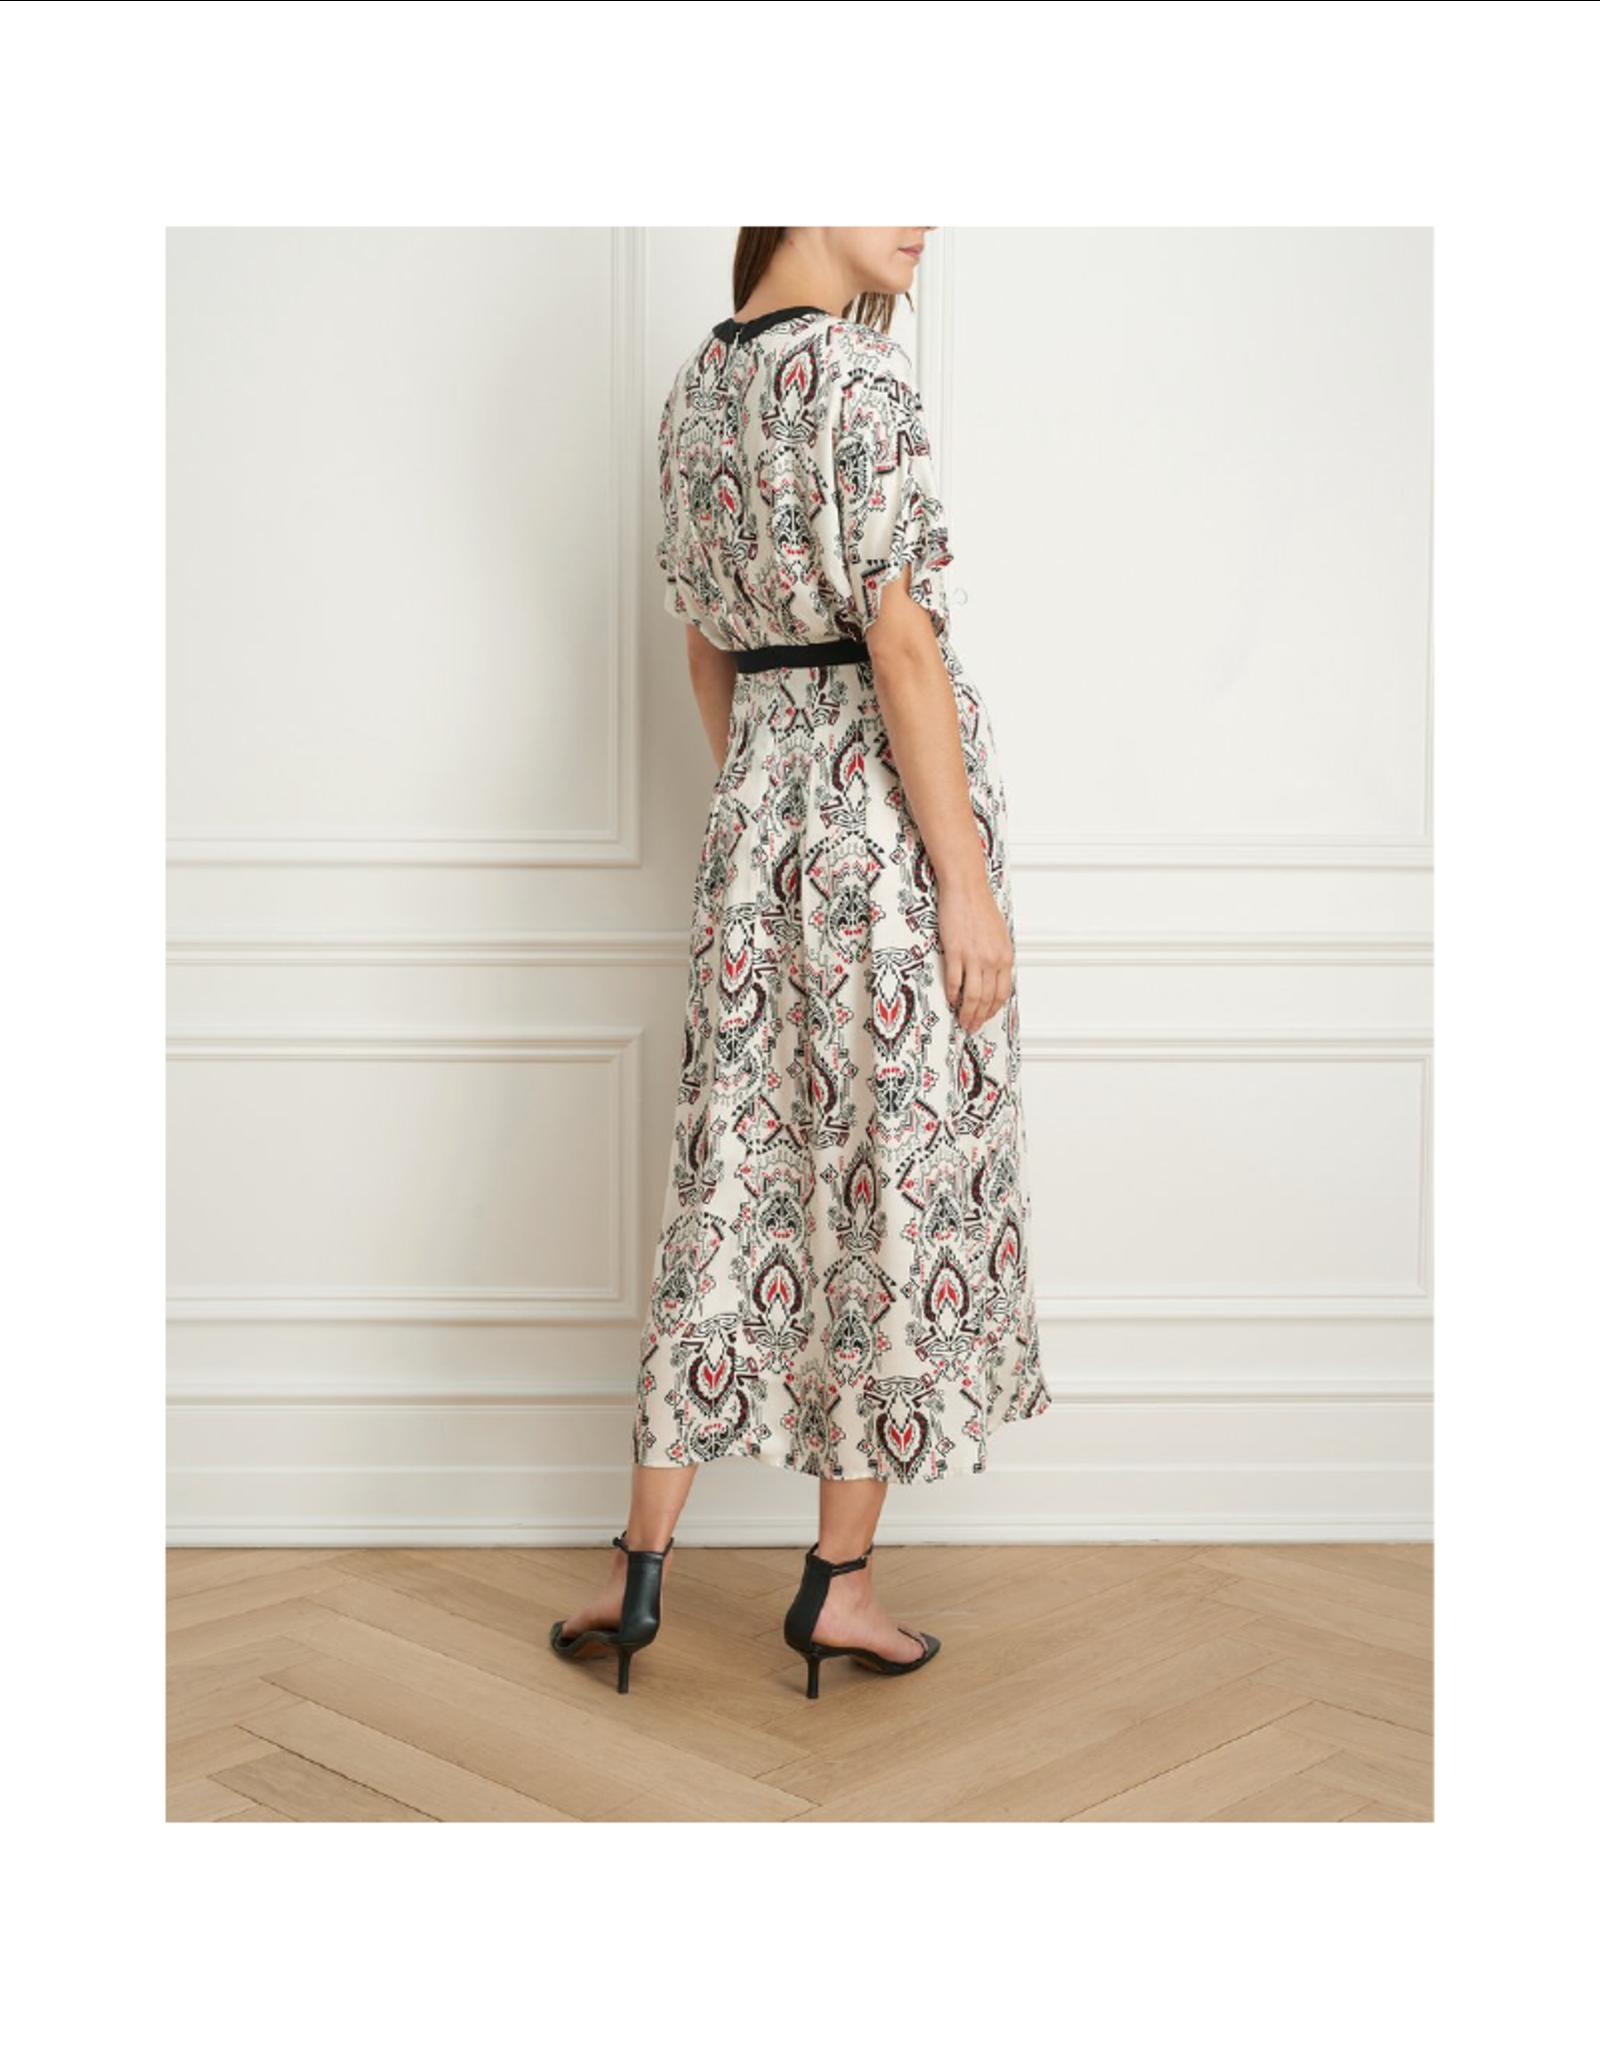 Iris V-Neck Printed Slit Dress